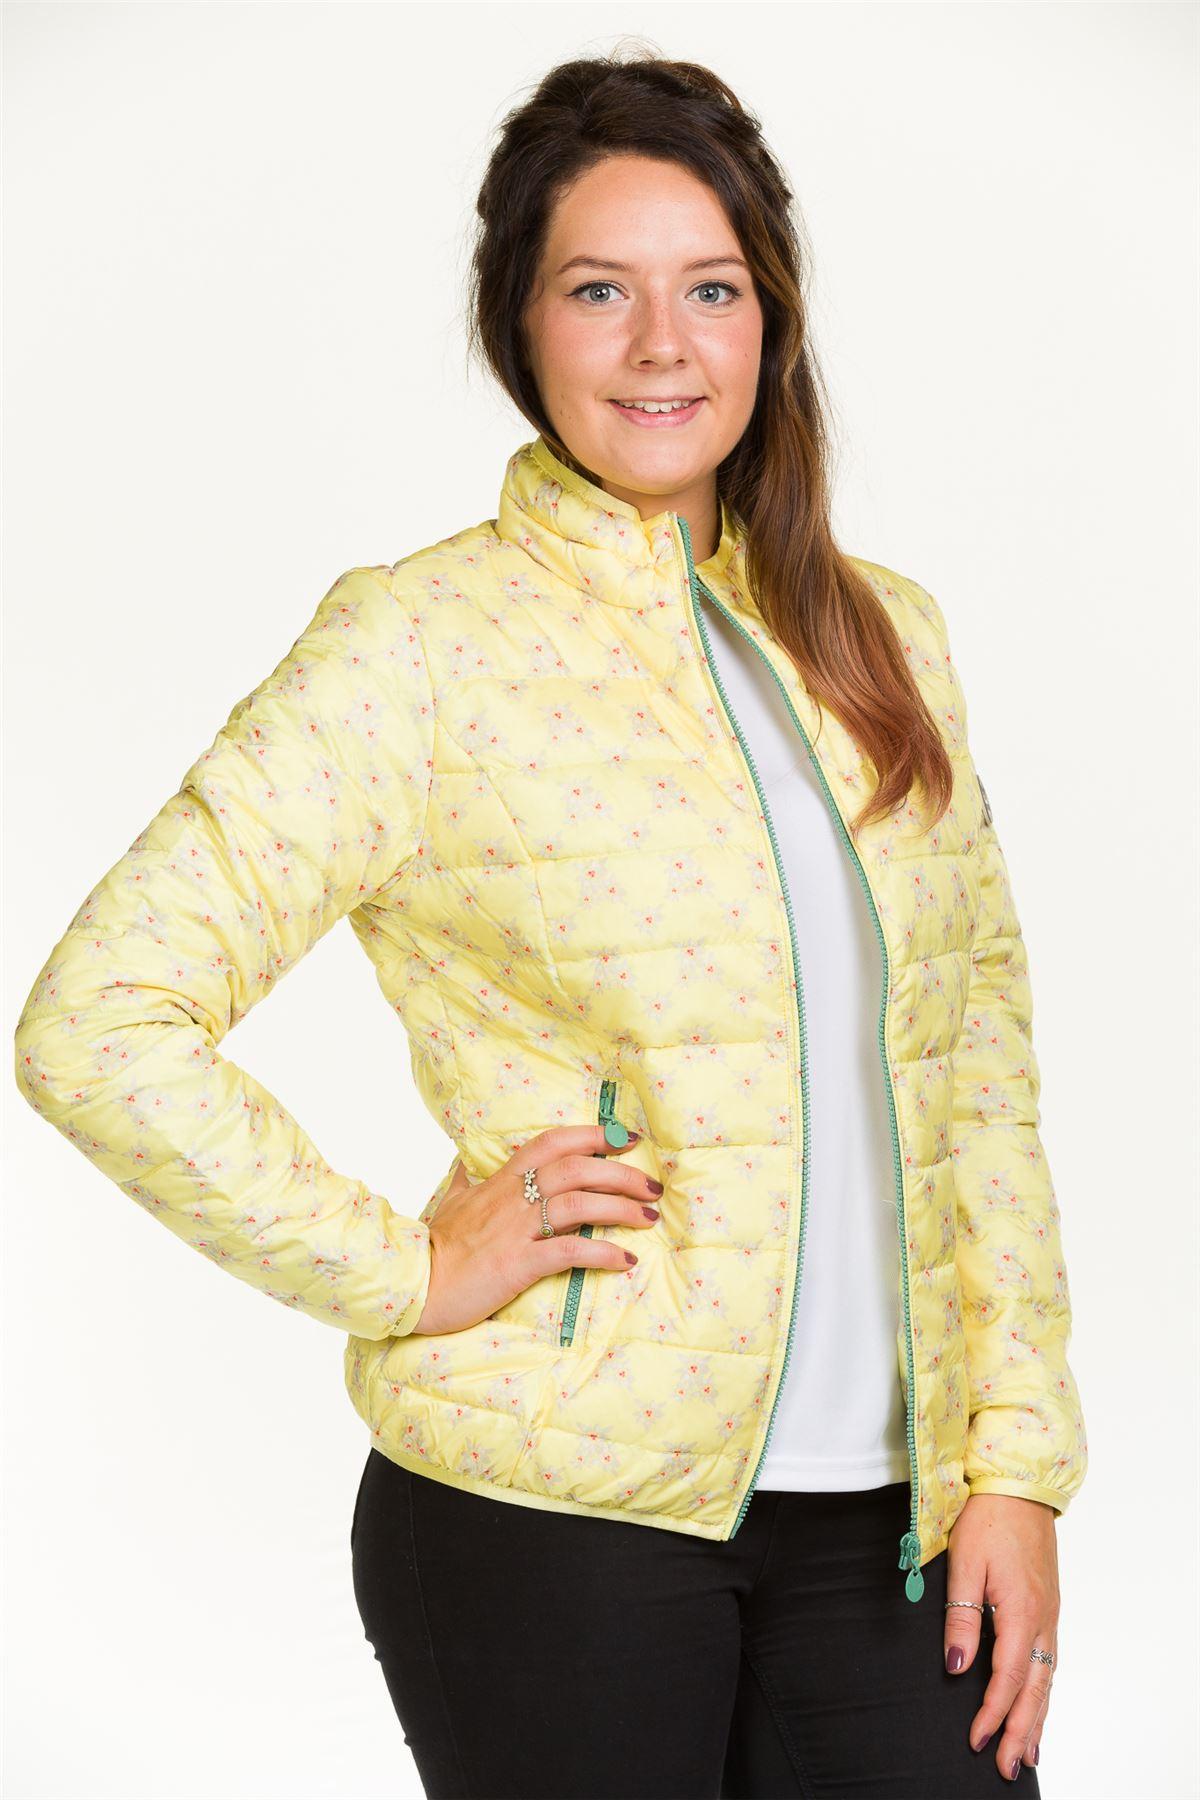 Donna-Giacca-Imbottita-giu-Piuma-fodera-leggera-blu-giallo-floreale-zip-Cappotto miniatura 5